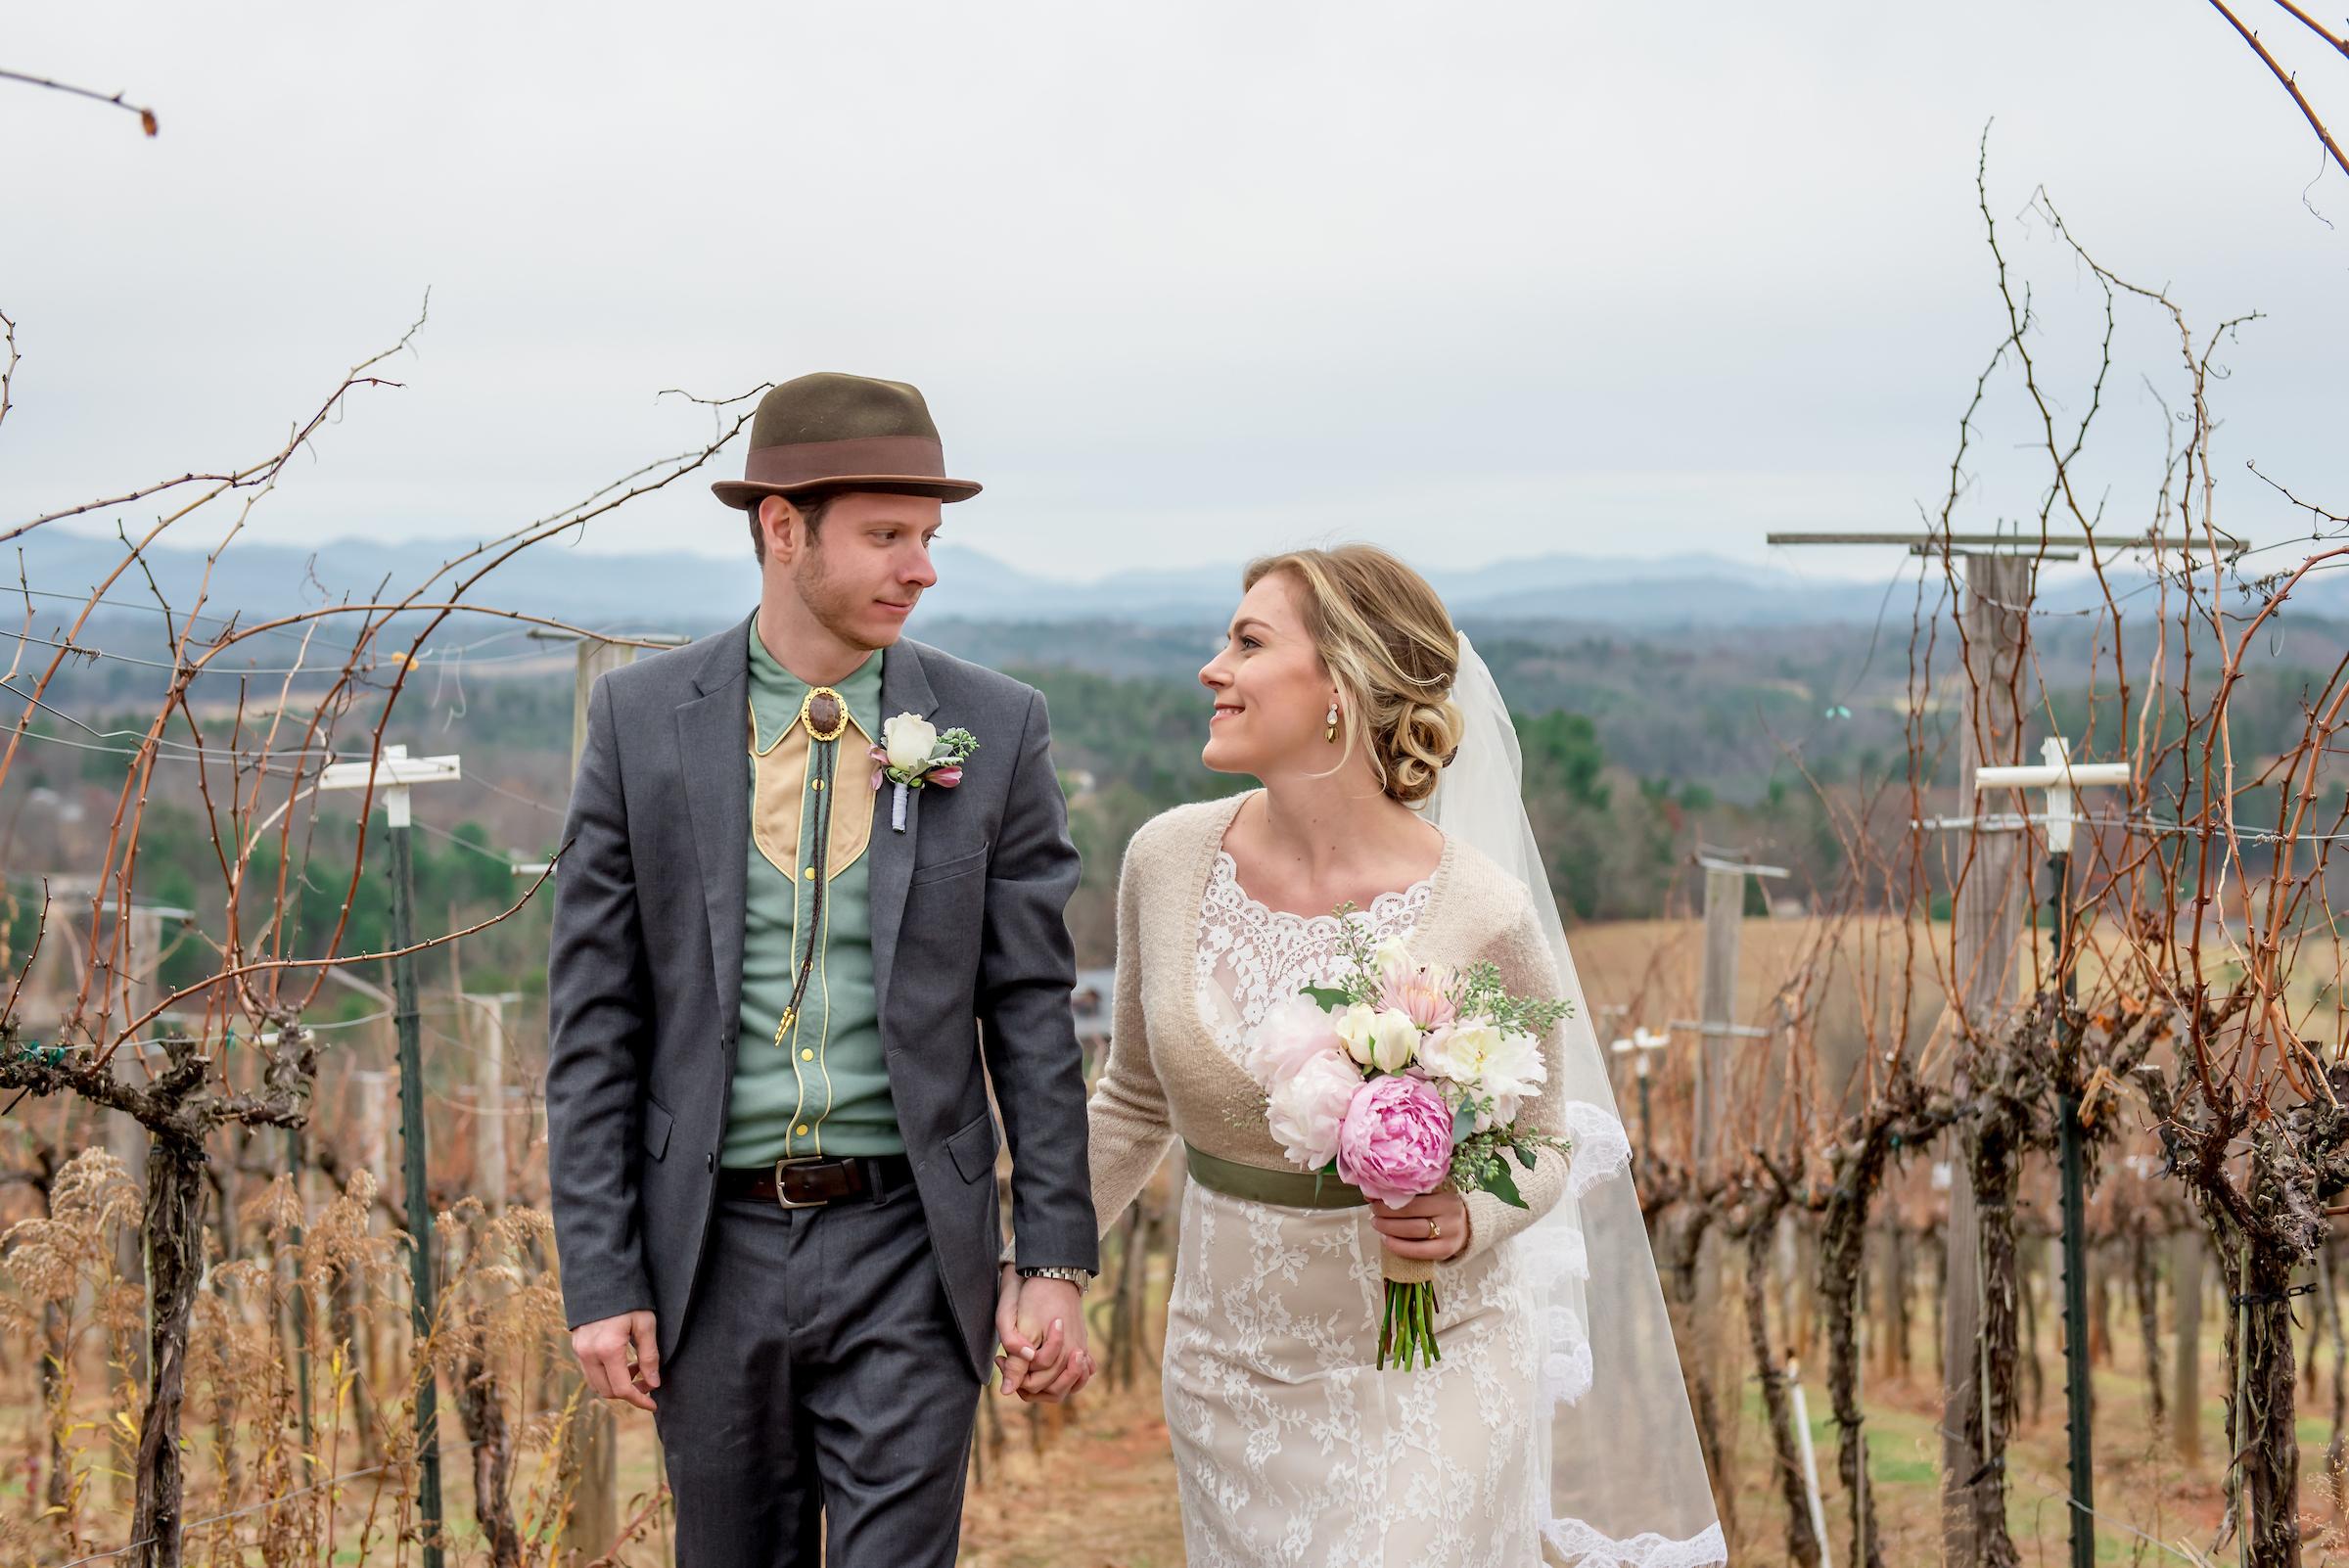 amanda-berk-photography-asheville-wedding-mountain-wedding-winery-wedding-ti-adora-wedding-dress-southern-wedding-destination-wedding-mountain-elopement-savannah-bridal-boutique-ivory-and-beau-bridal-boutique-savannah-weddings-9.jpg